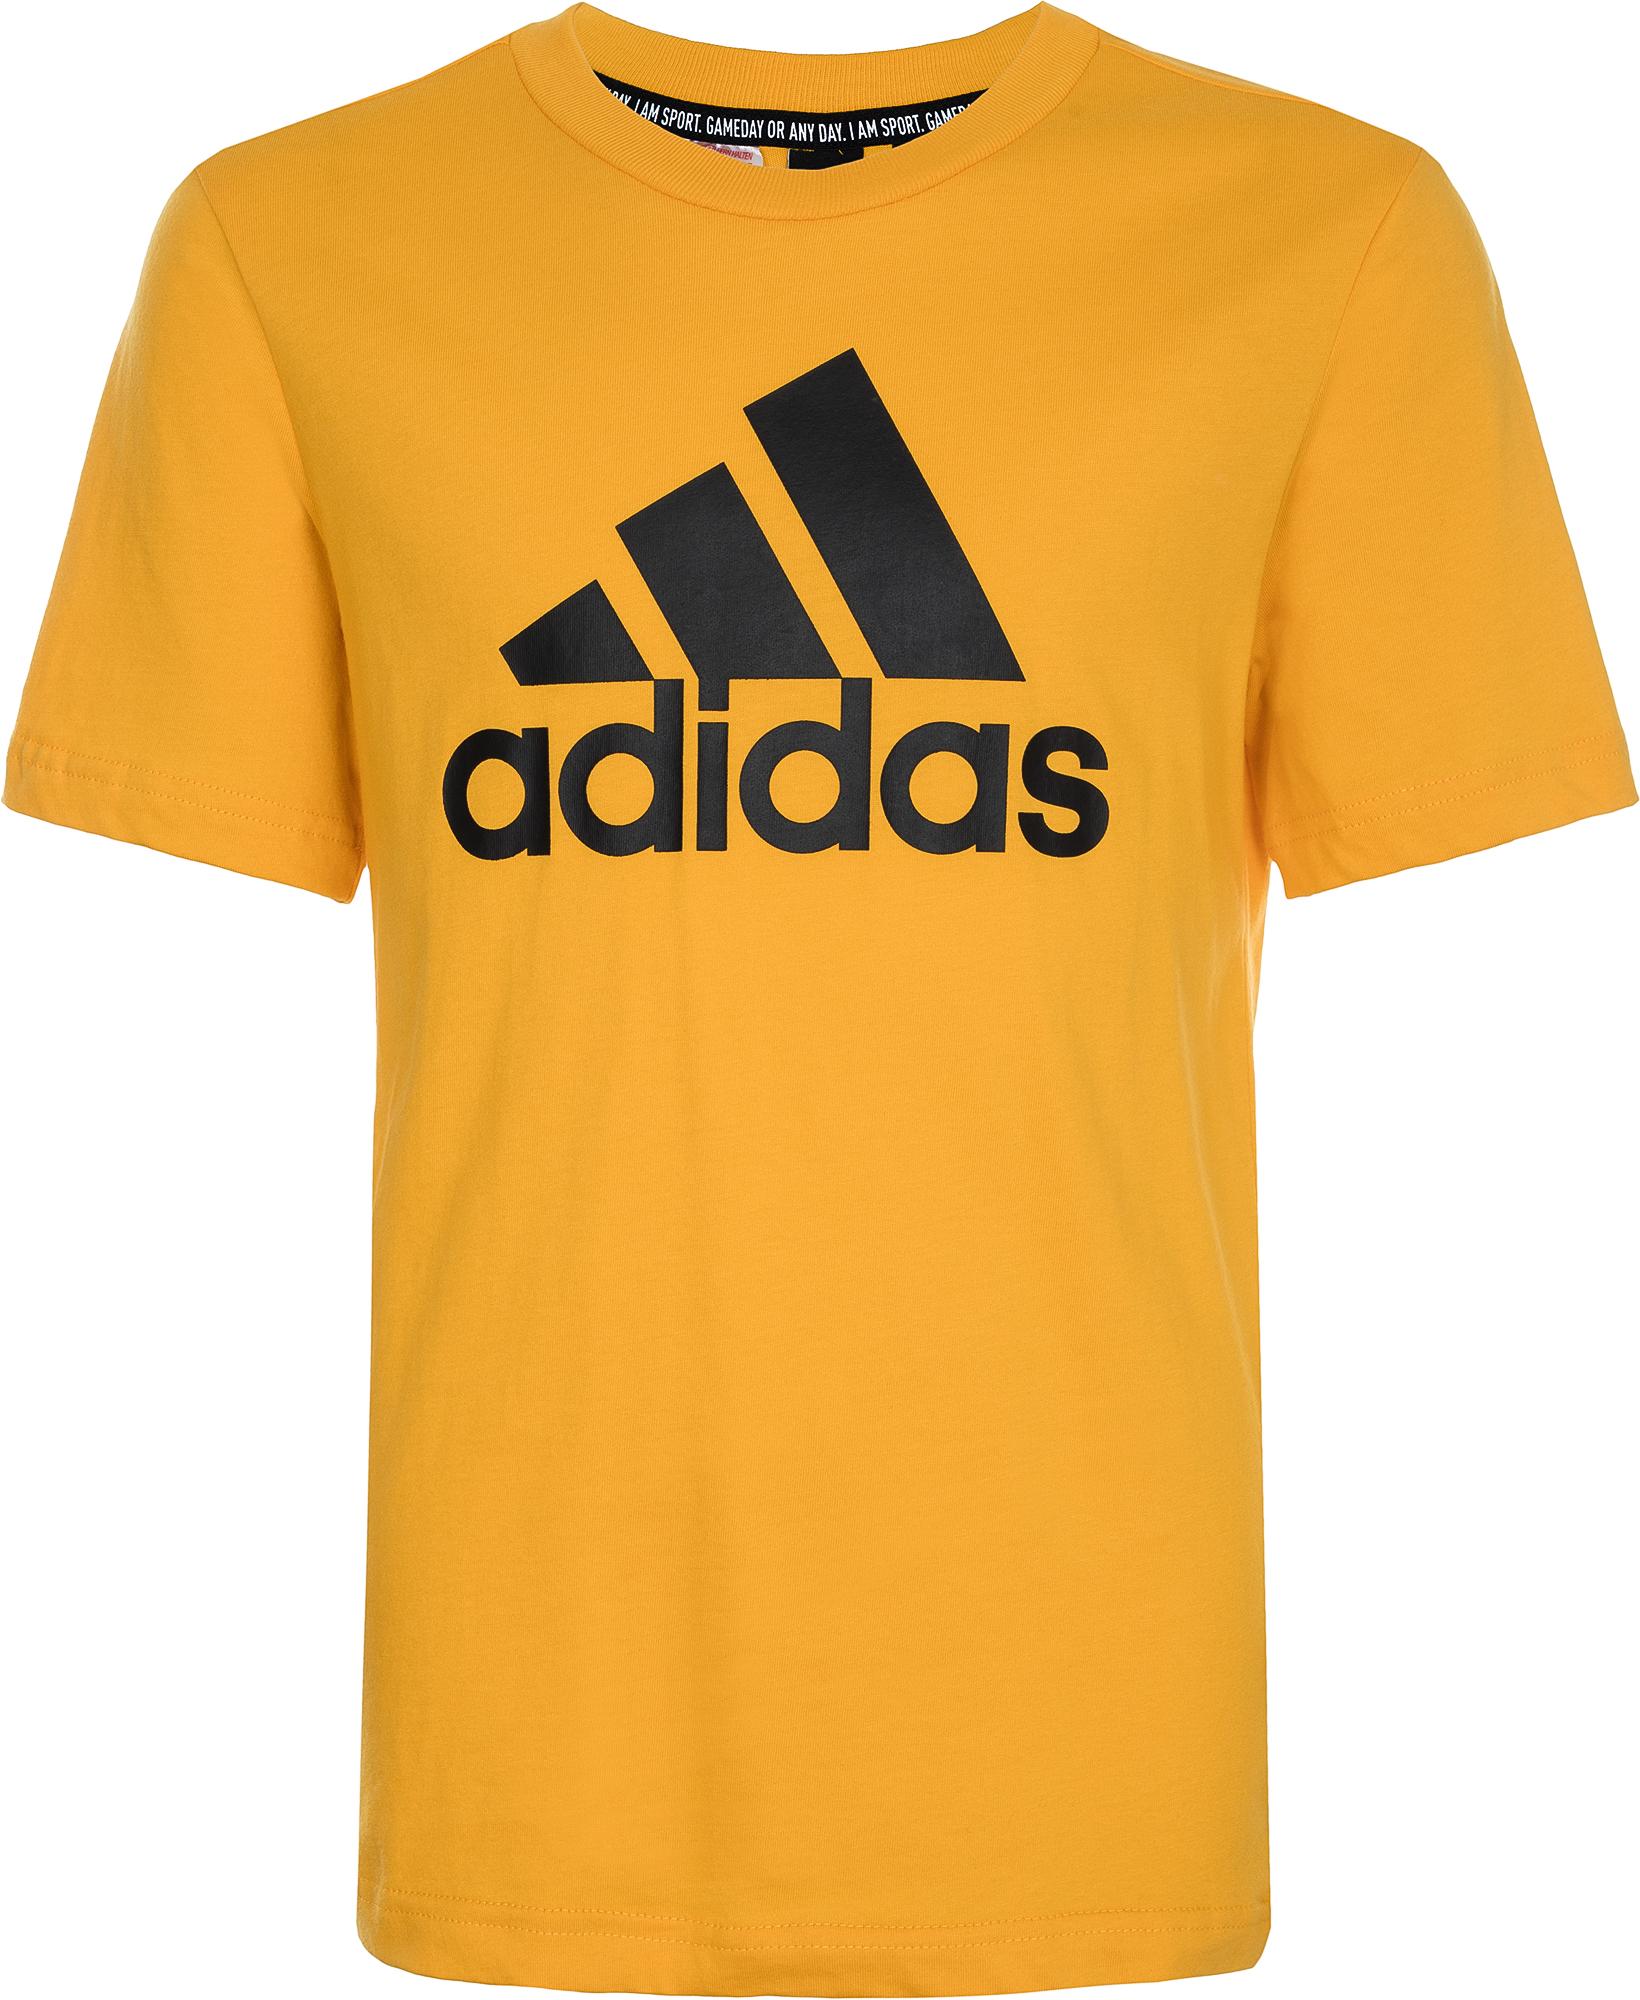 Adidas Футболка для мальчиков Adidas, размер 152